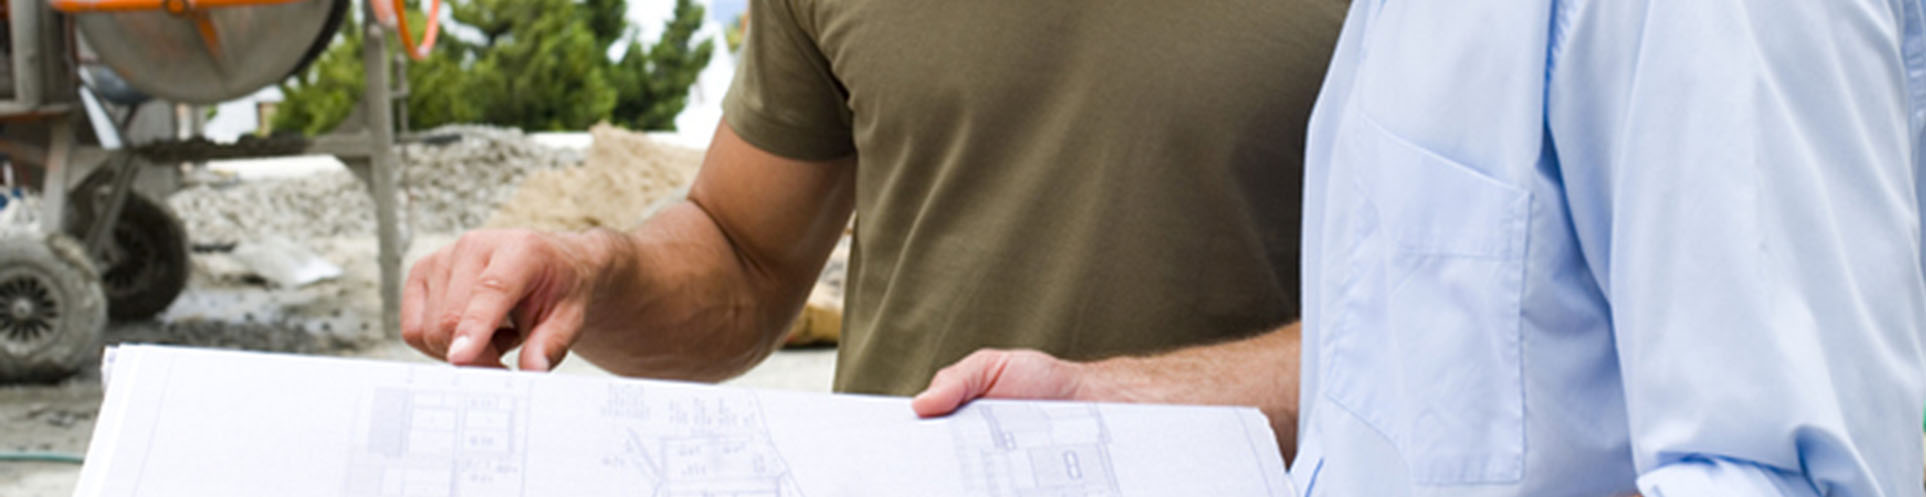 Civil Liability for Construction